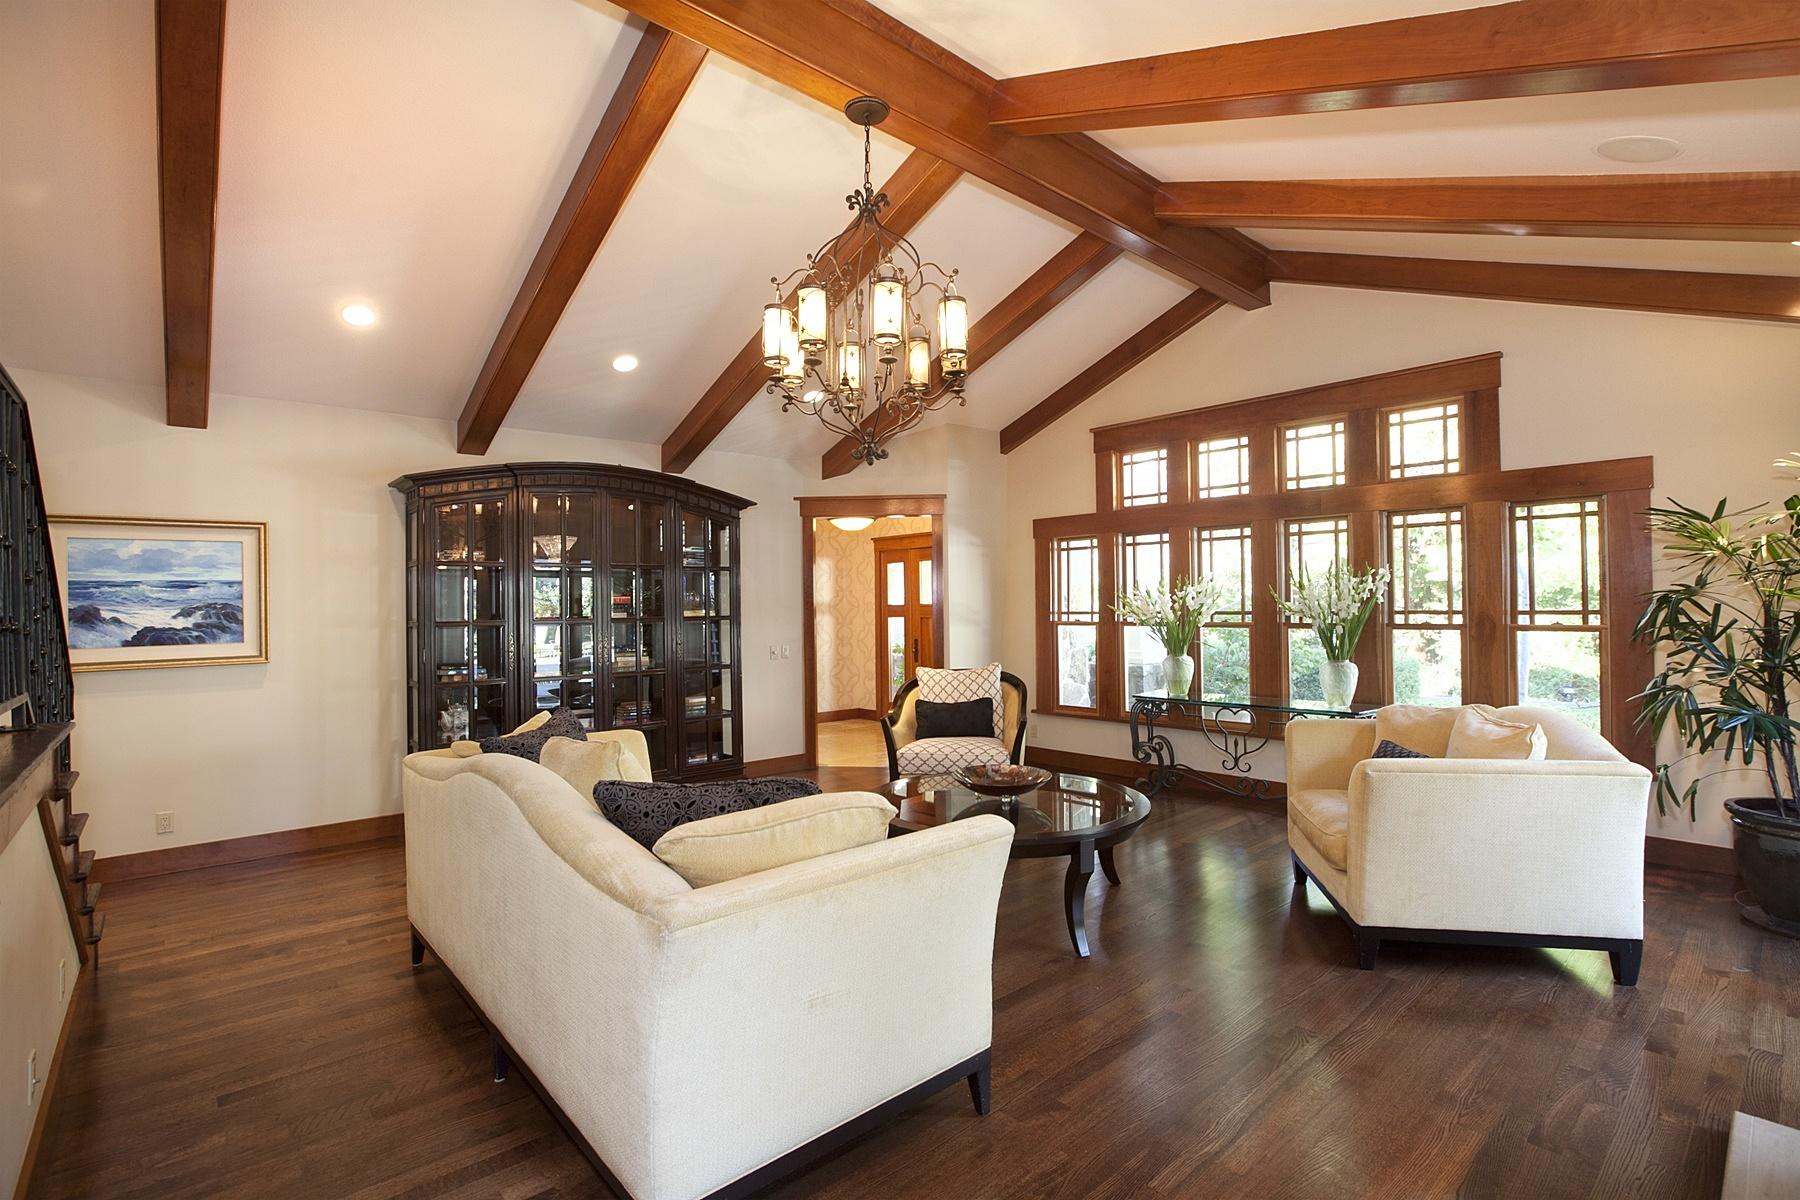 Additional photo for property listing at Charming Private Estate ~ Diablo Country Club 1830 Alameda Diablo Diablo, California 94528 United States